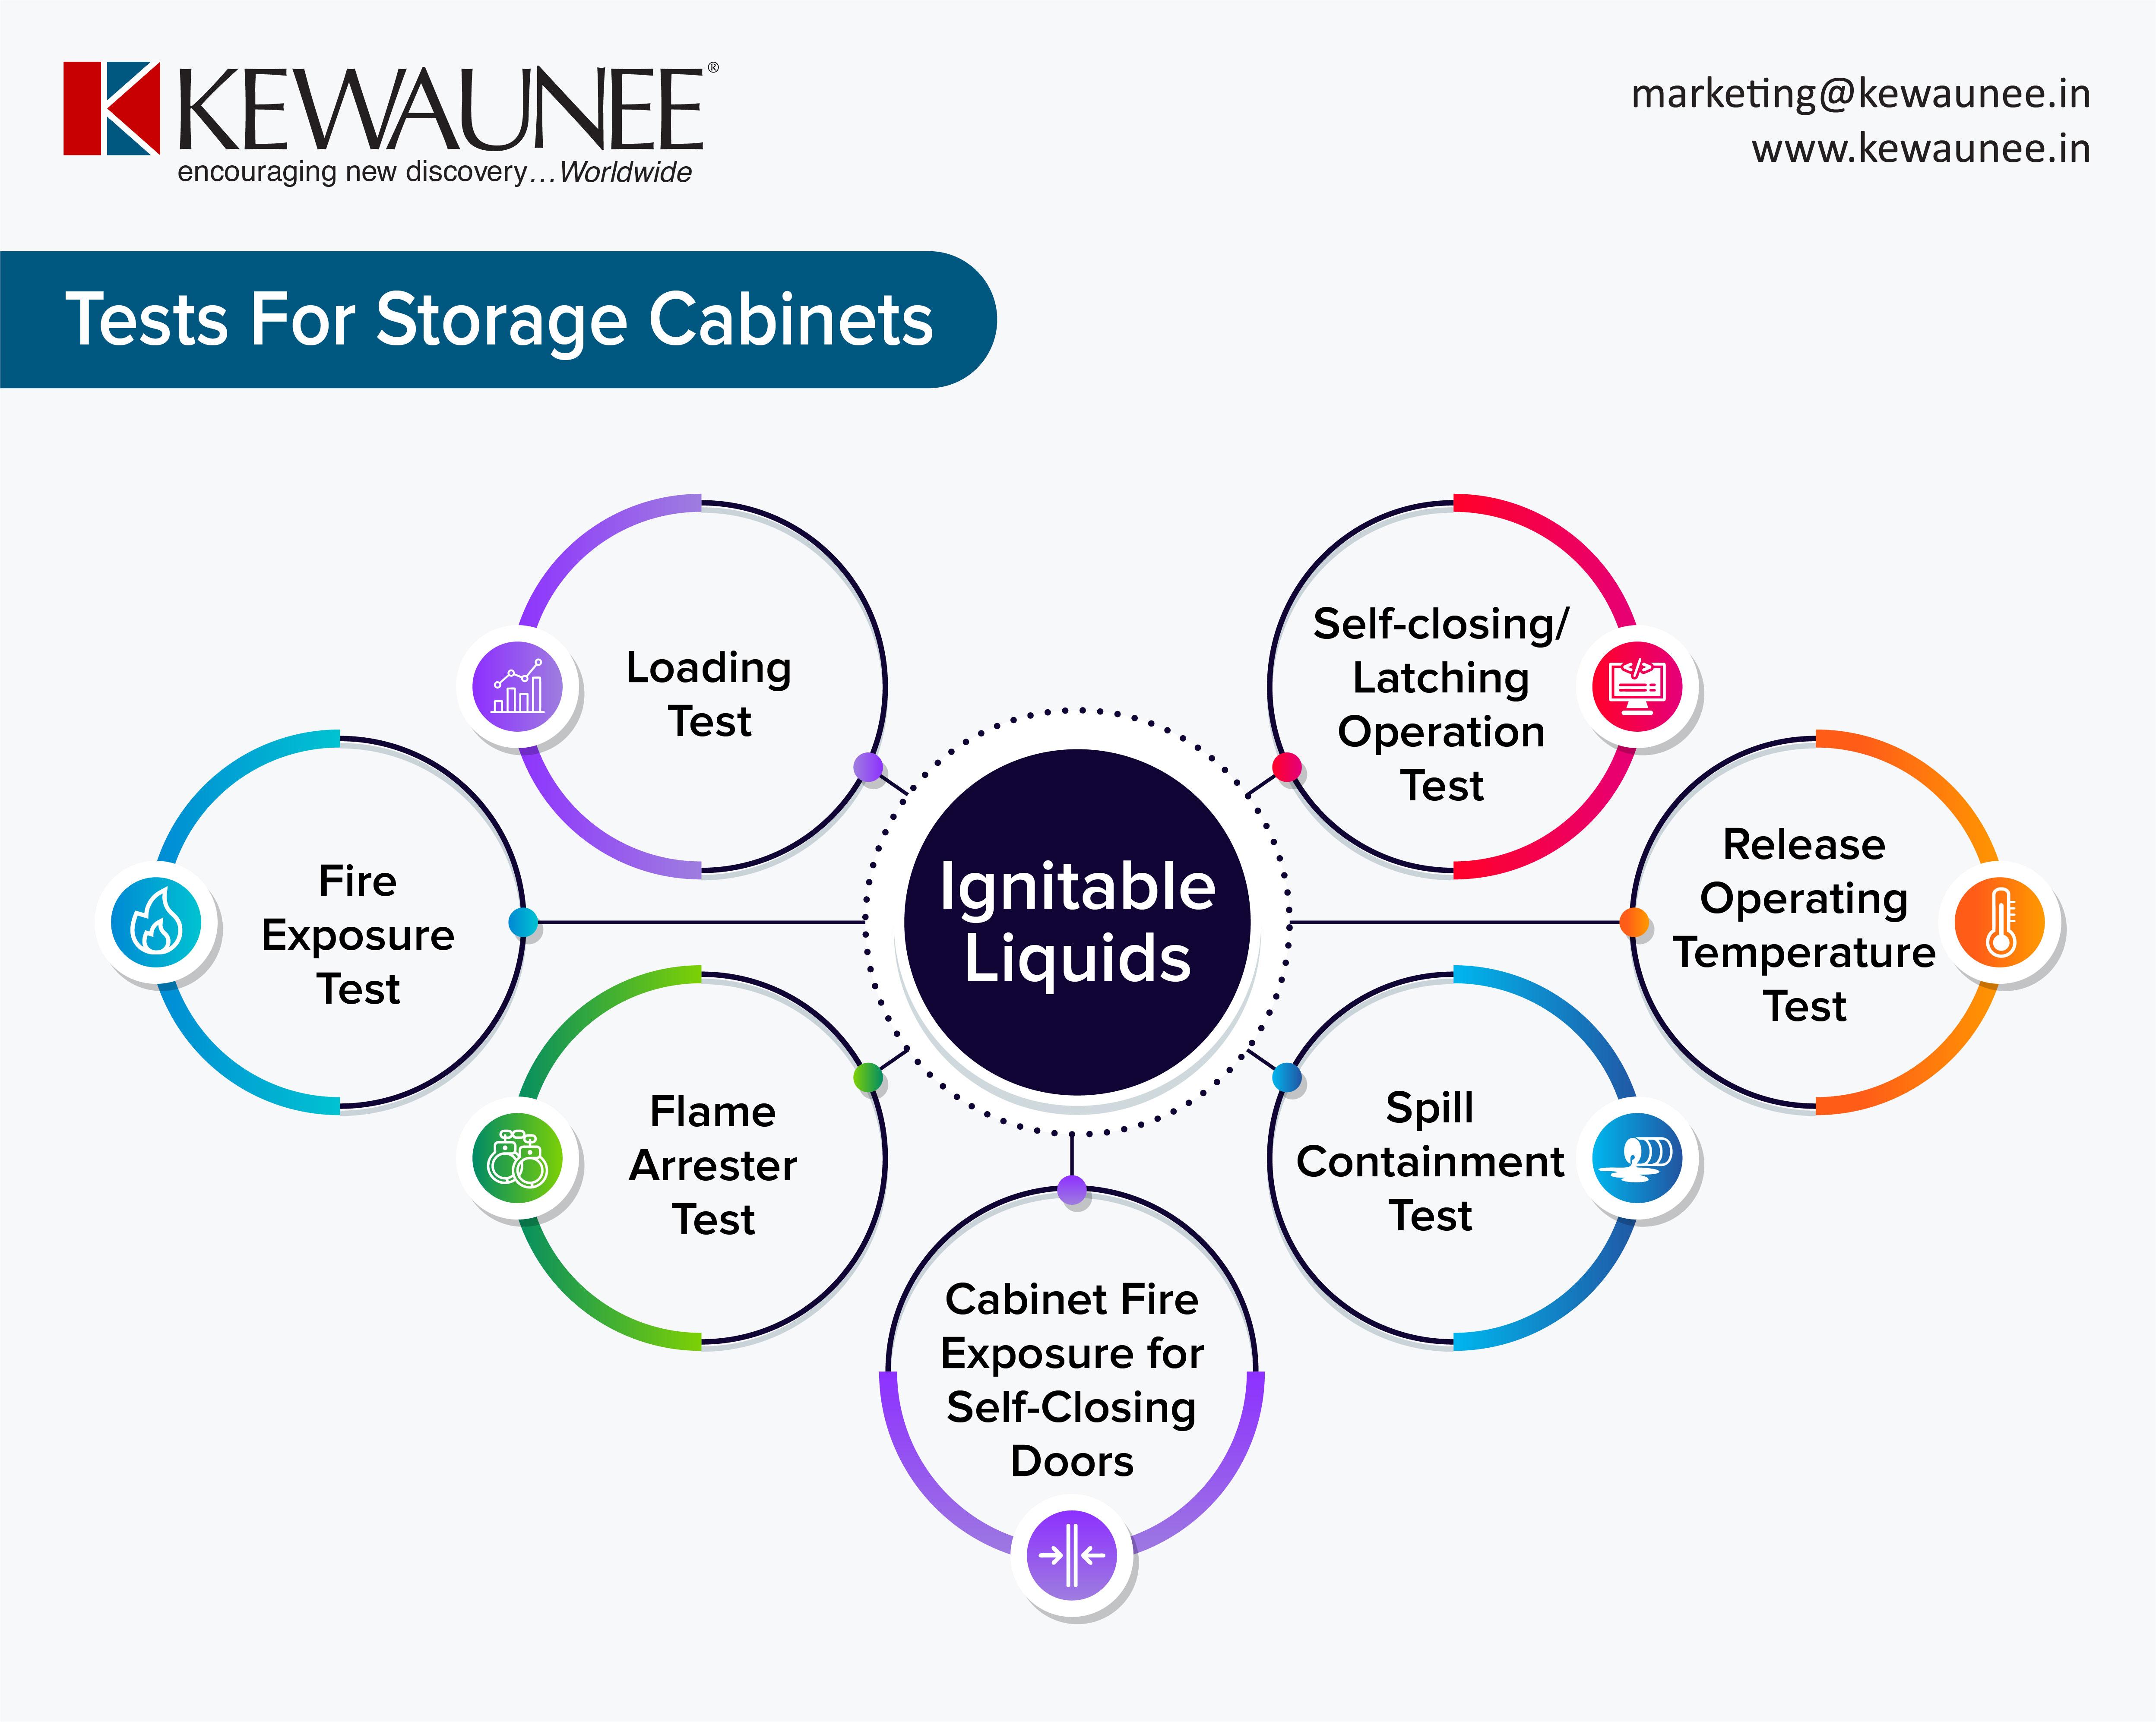 Storage Cabinets Tests